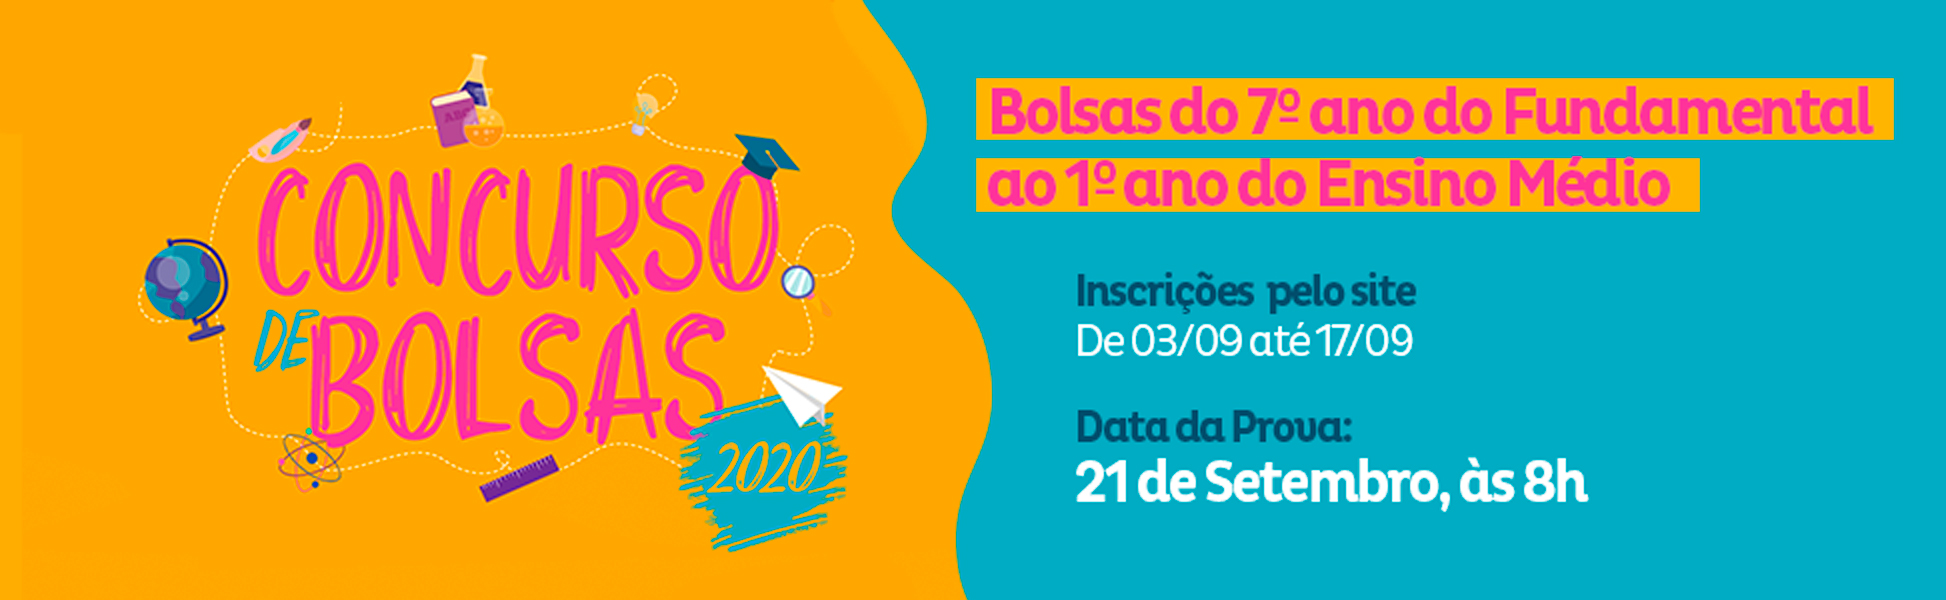 Concurso de Bolsas 2020